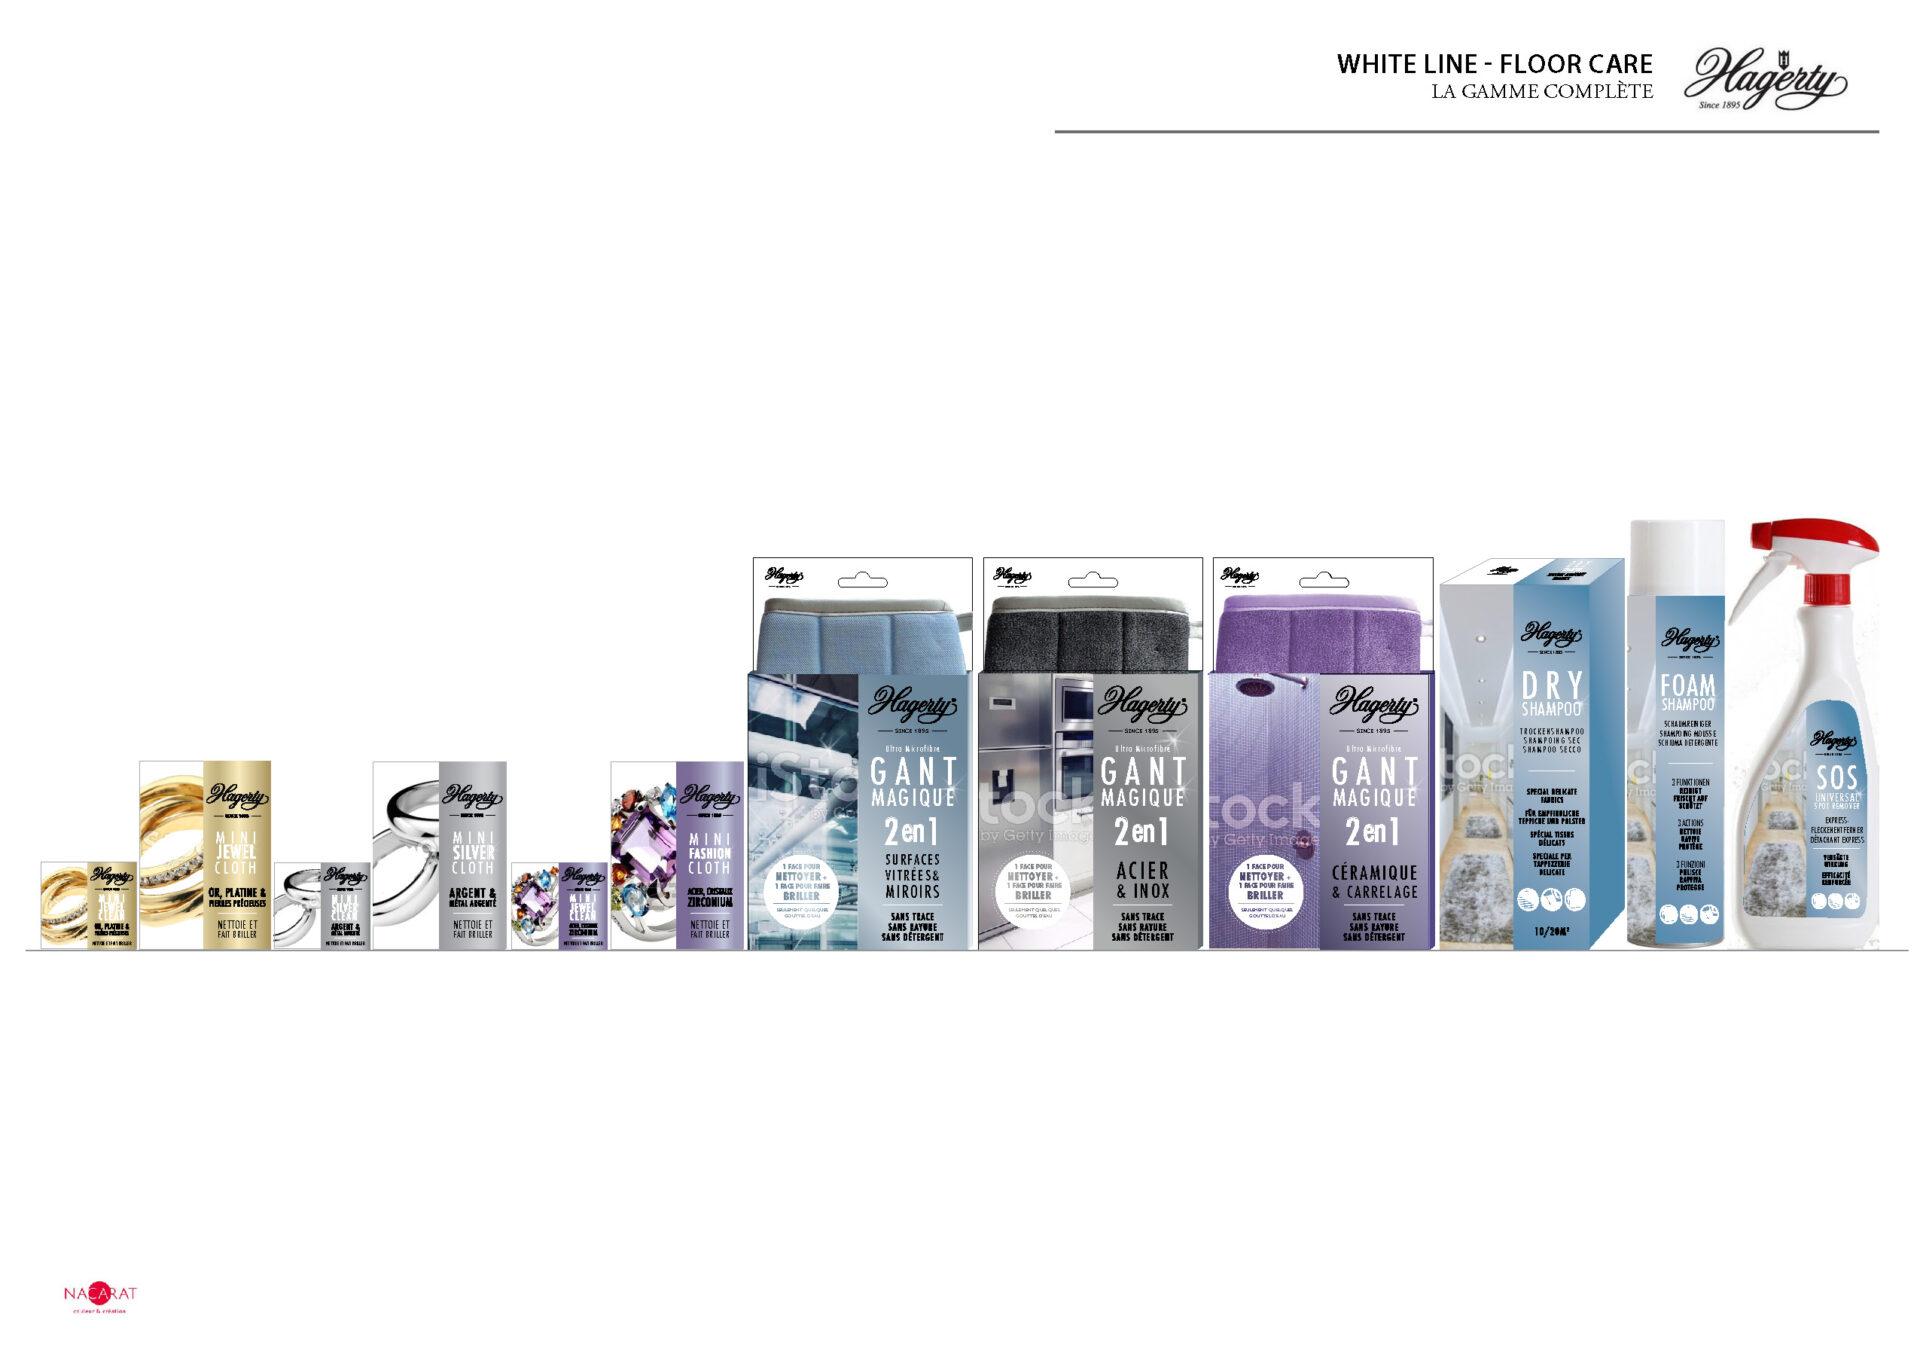 Nacarat-design-pack-White-Line-HAGERTY-ligne-GS